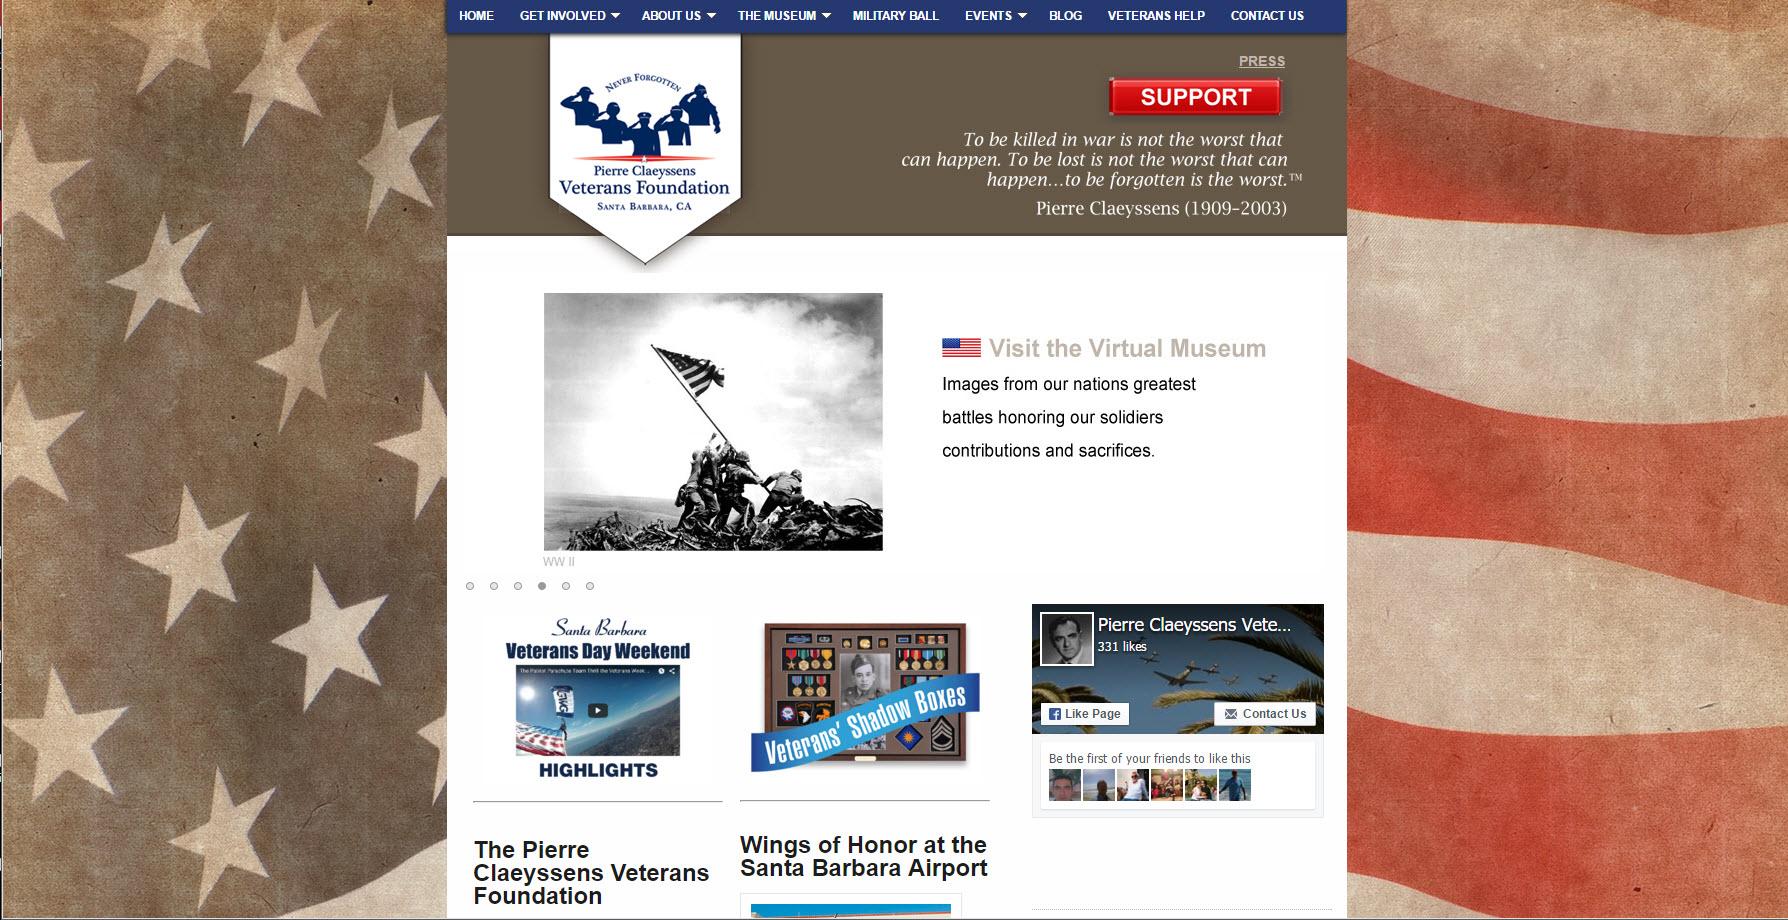 Santa Barbara Veterans Museum - Pierre Claeyssens Veterans Museum